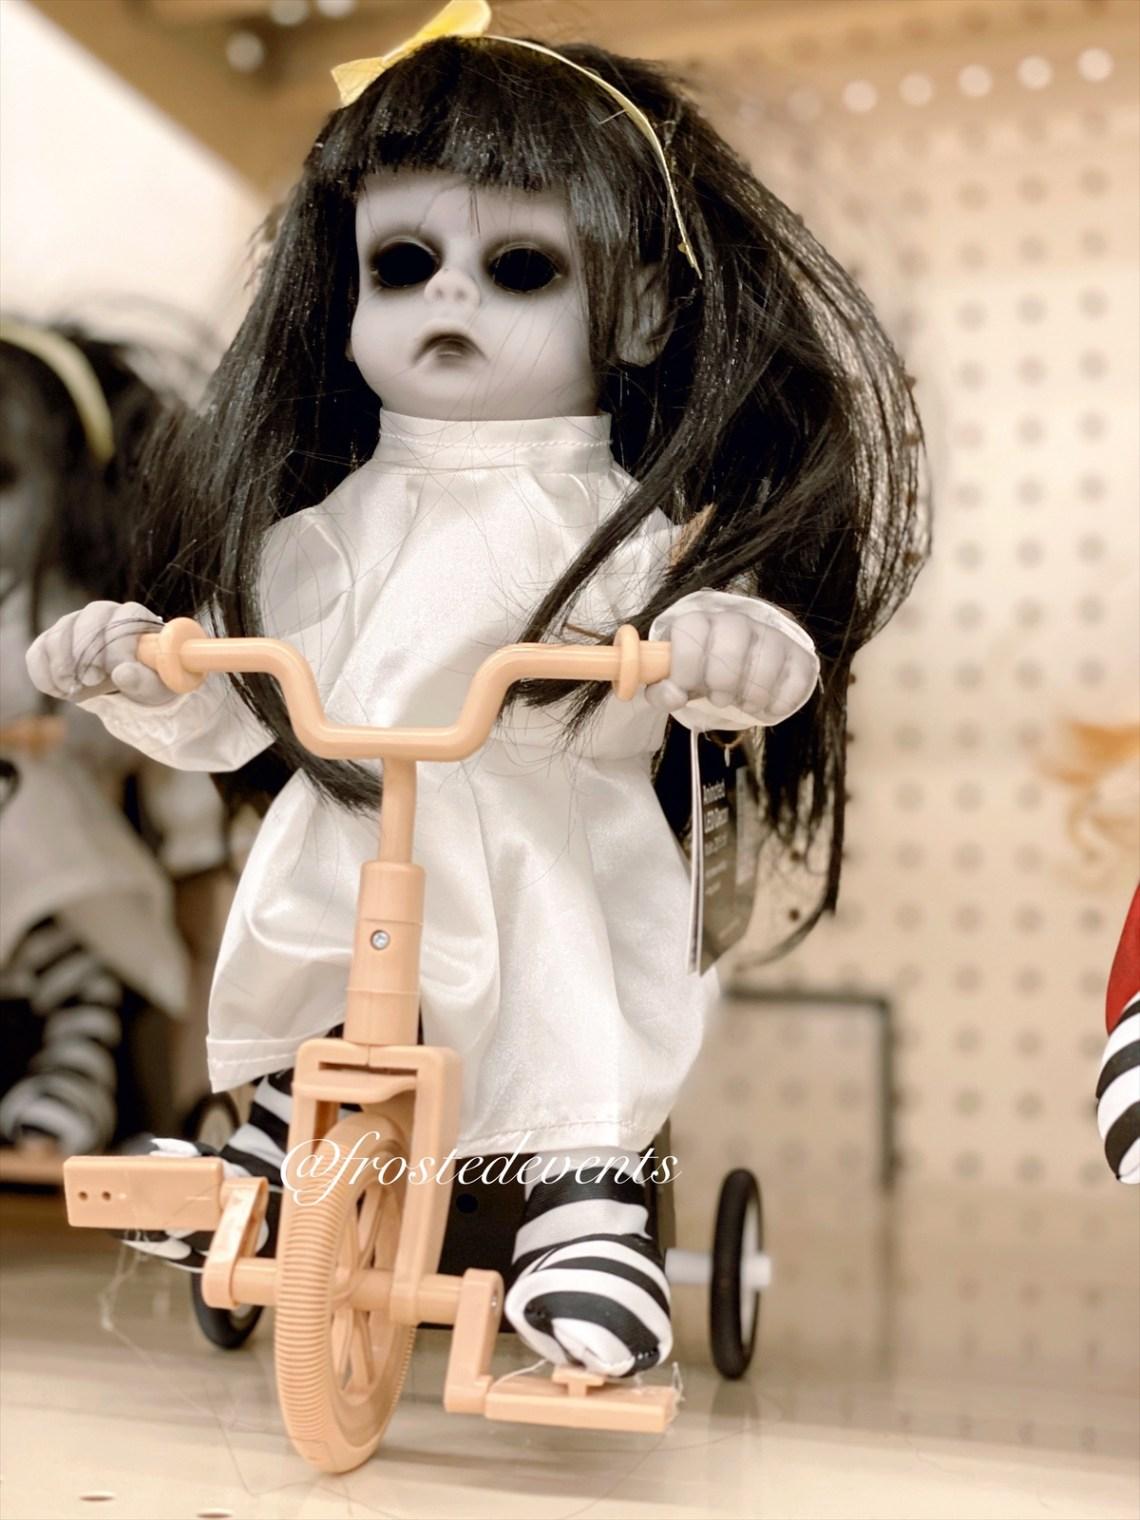 Halloween Decorations - Creepy Decor Big Lots Zombie Dolls